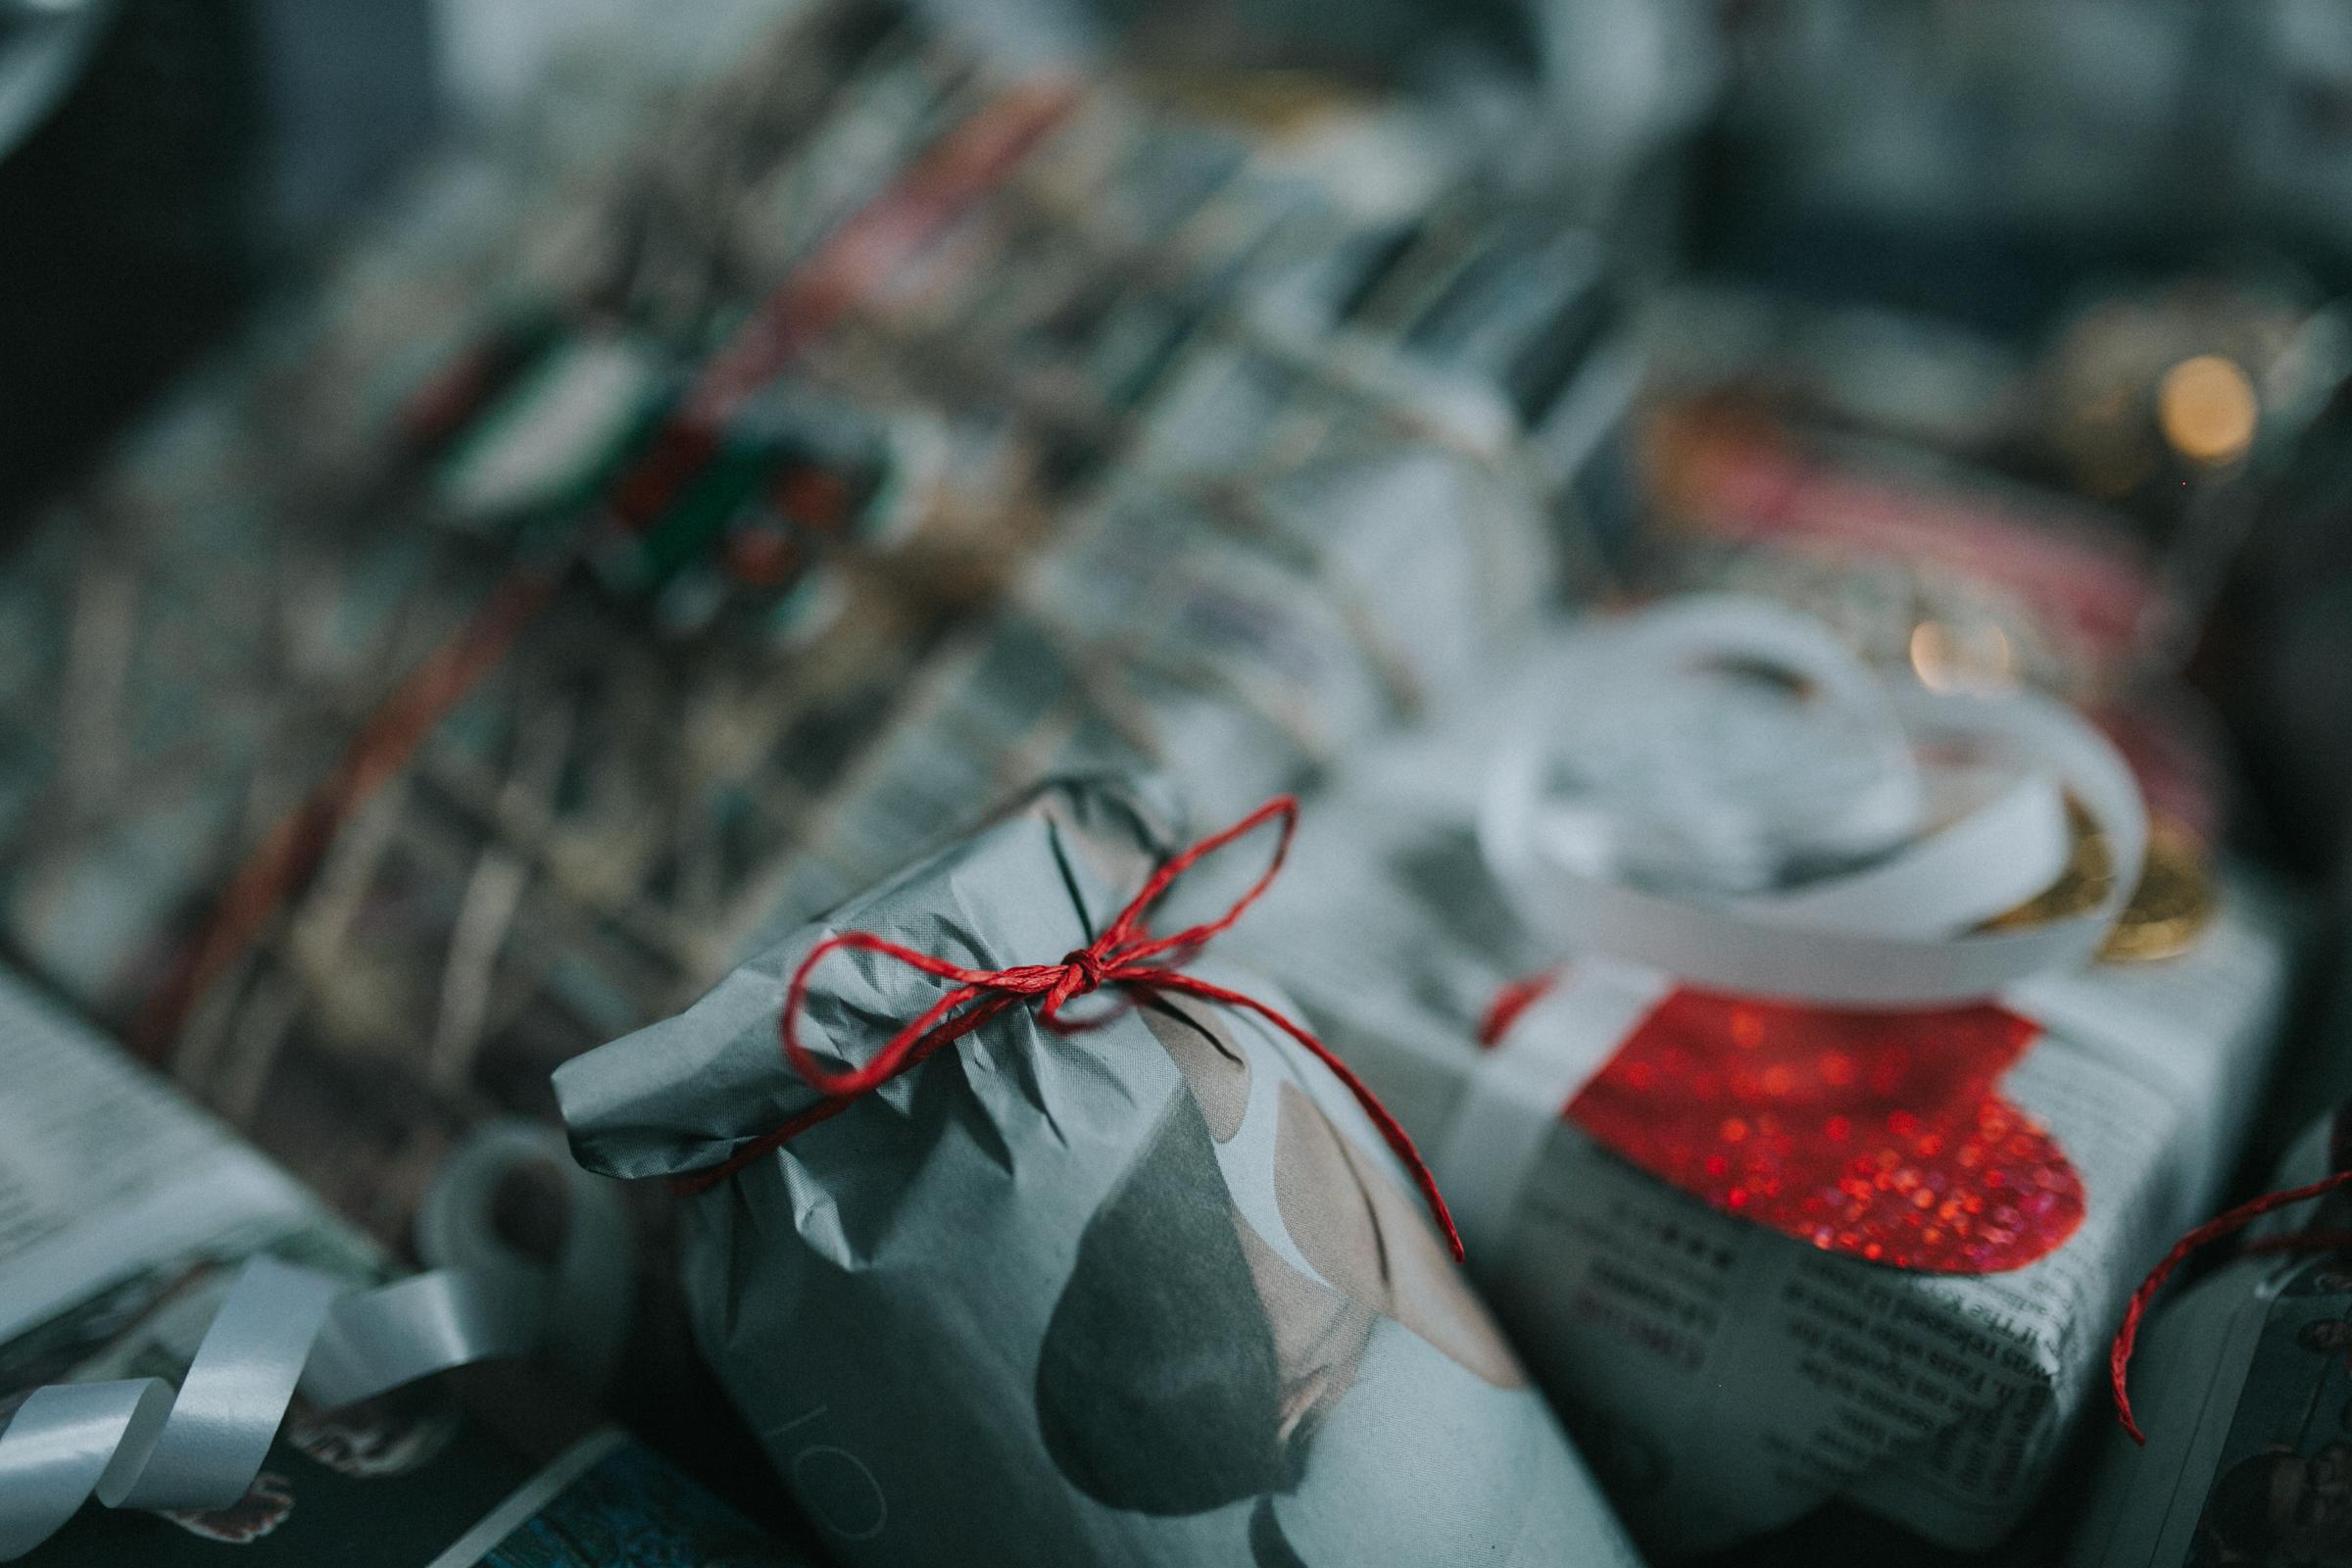 Christmas-gift-wrapping-ideas-minas-planet-minasplanet-how-to-wrap-christmas-presents-diy5.jpg